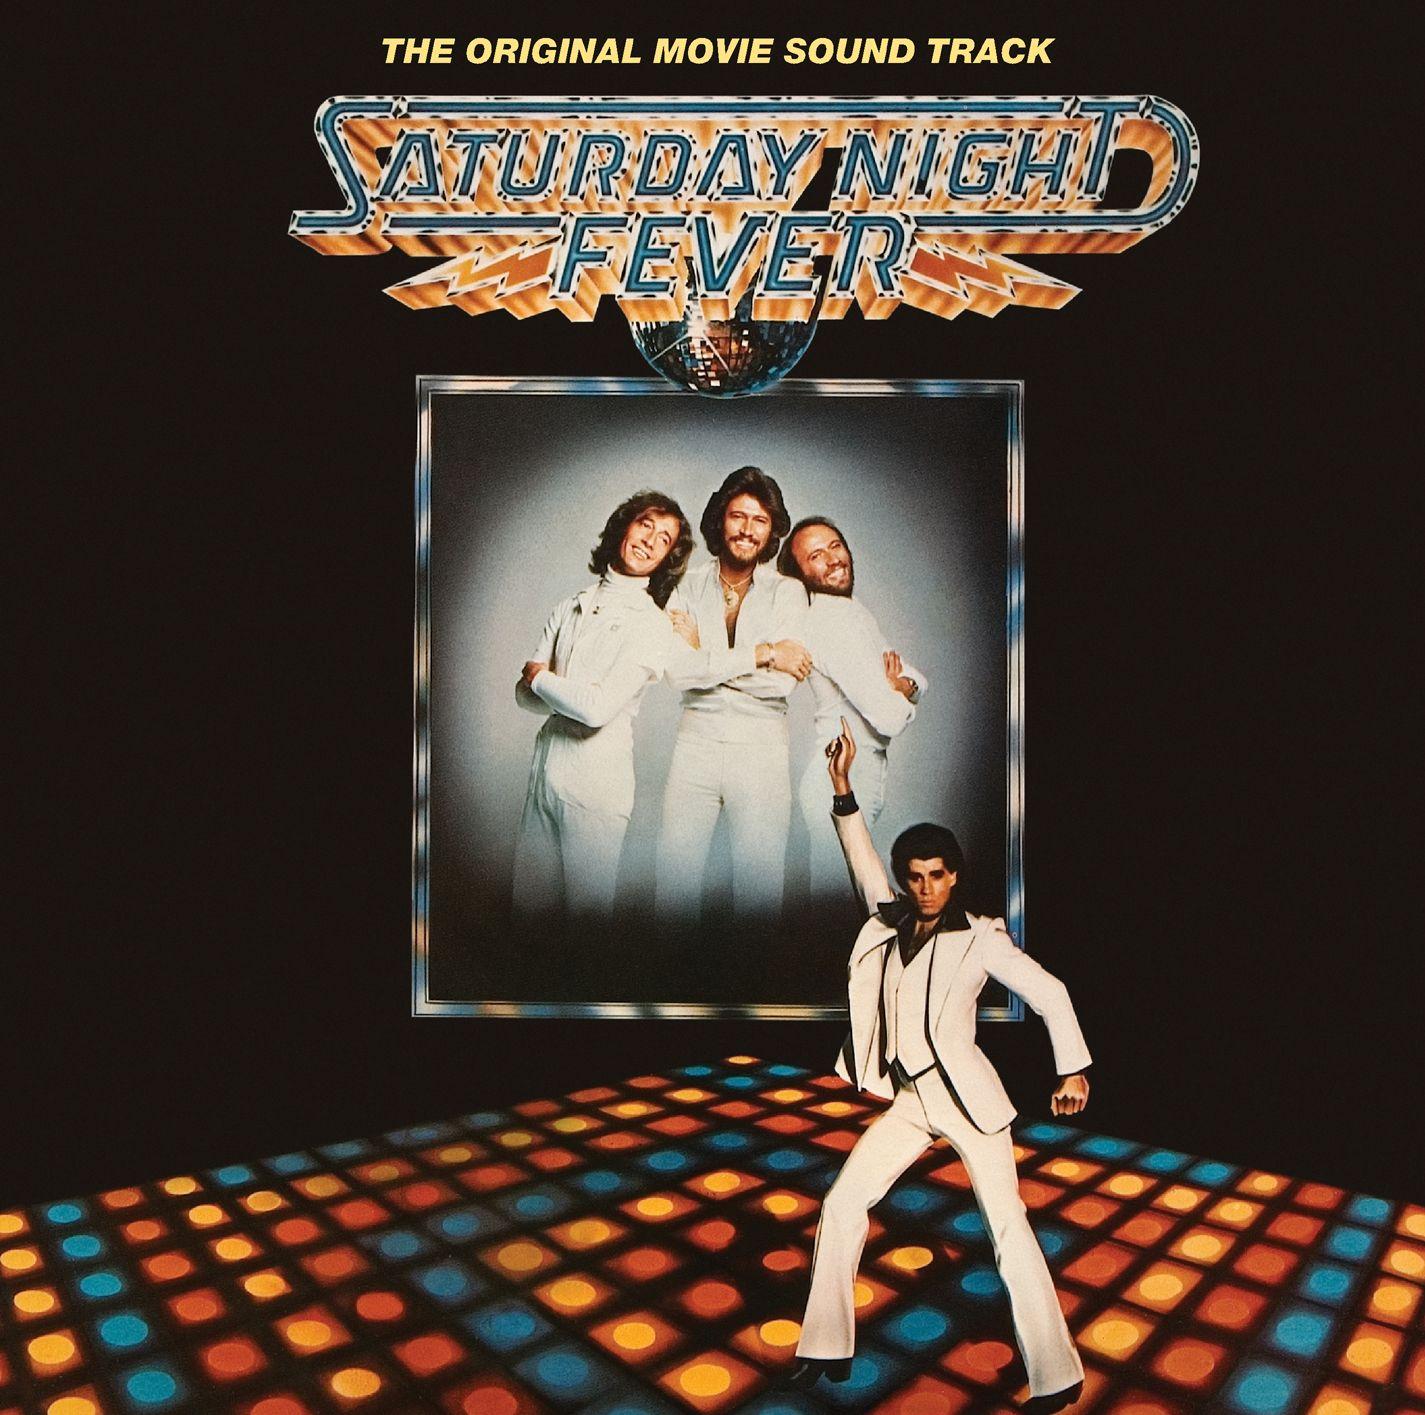 saturdaynightfever The 100 Greatest Movie Soundtracks of All Time